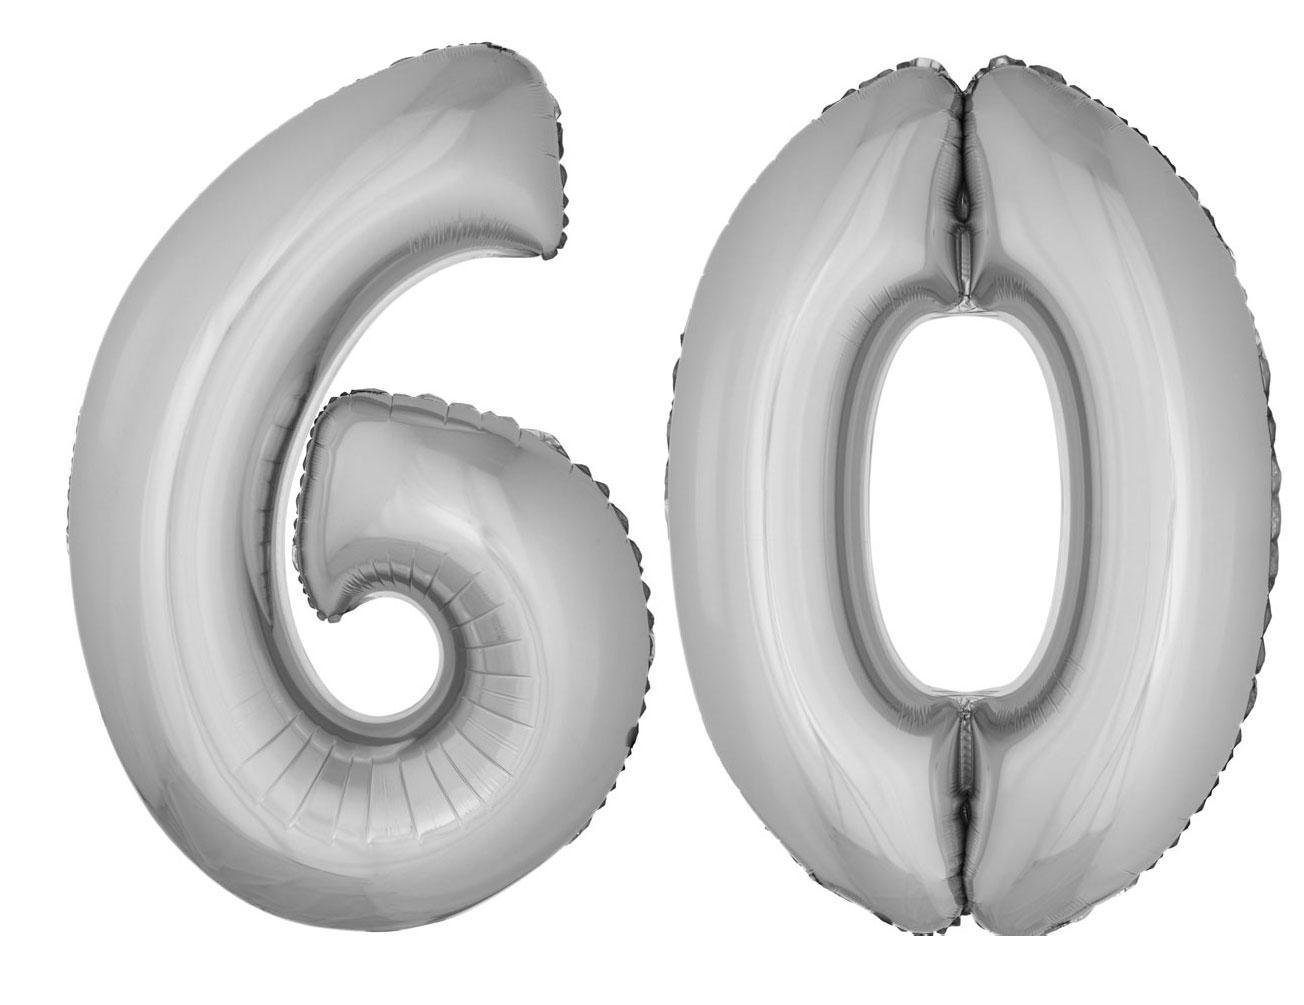 Folienballons Luftballon Setxxl Zahl Geburtstag 60 Jahre Silber